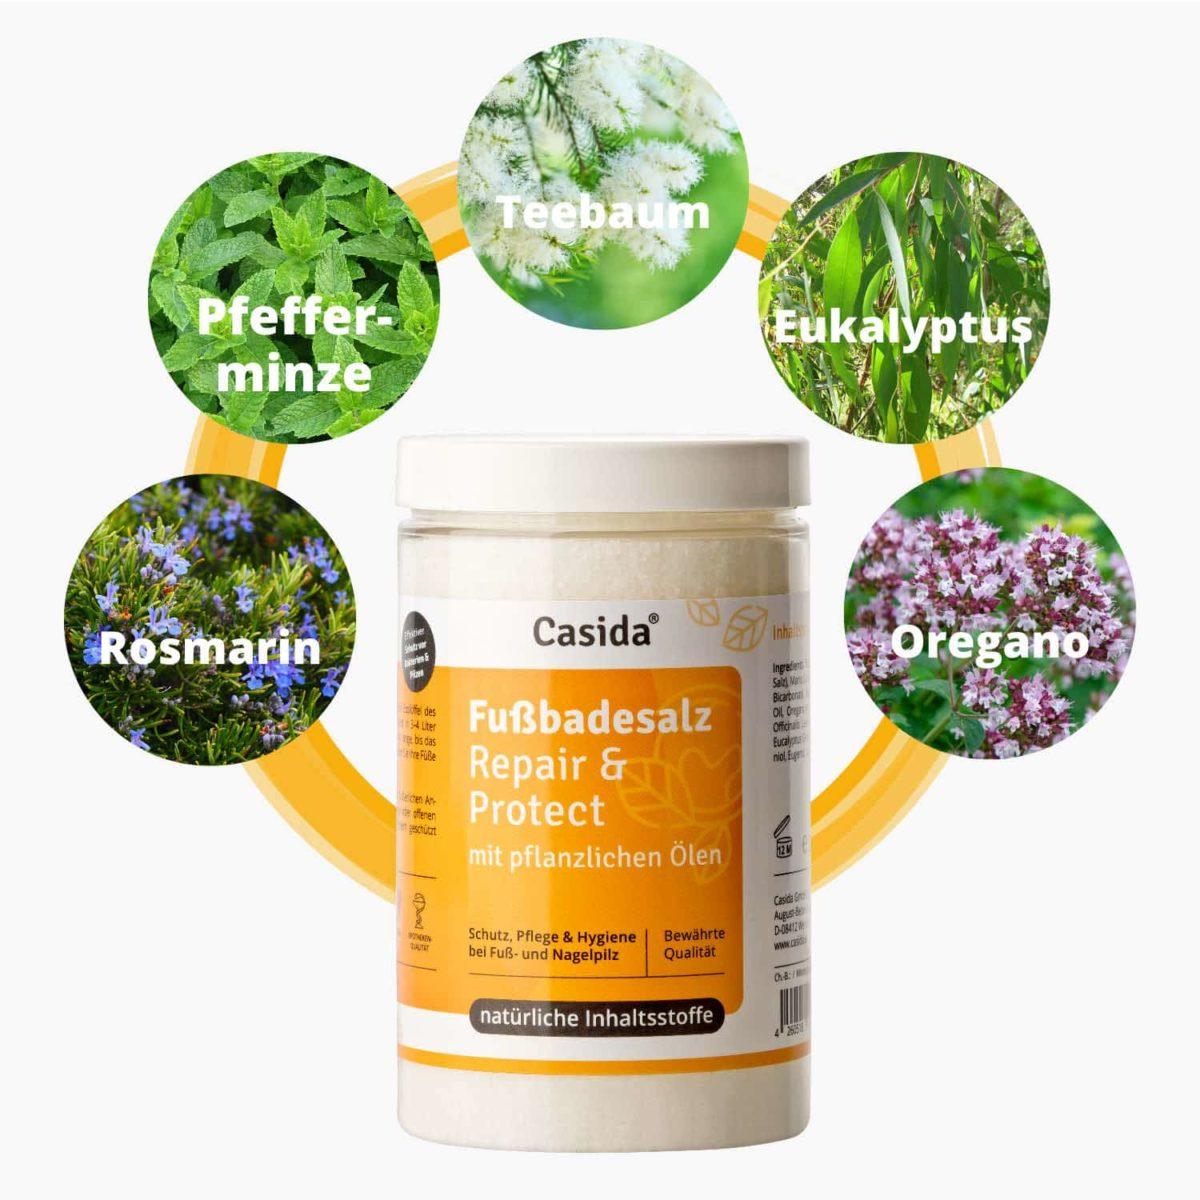 Casida Product Combo Nail Oil and Foot Bath Salt Bundle PZN 10022445 12907018 Nagelpilz bekämpfen pflanzlich Fußpilz2